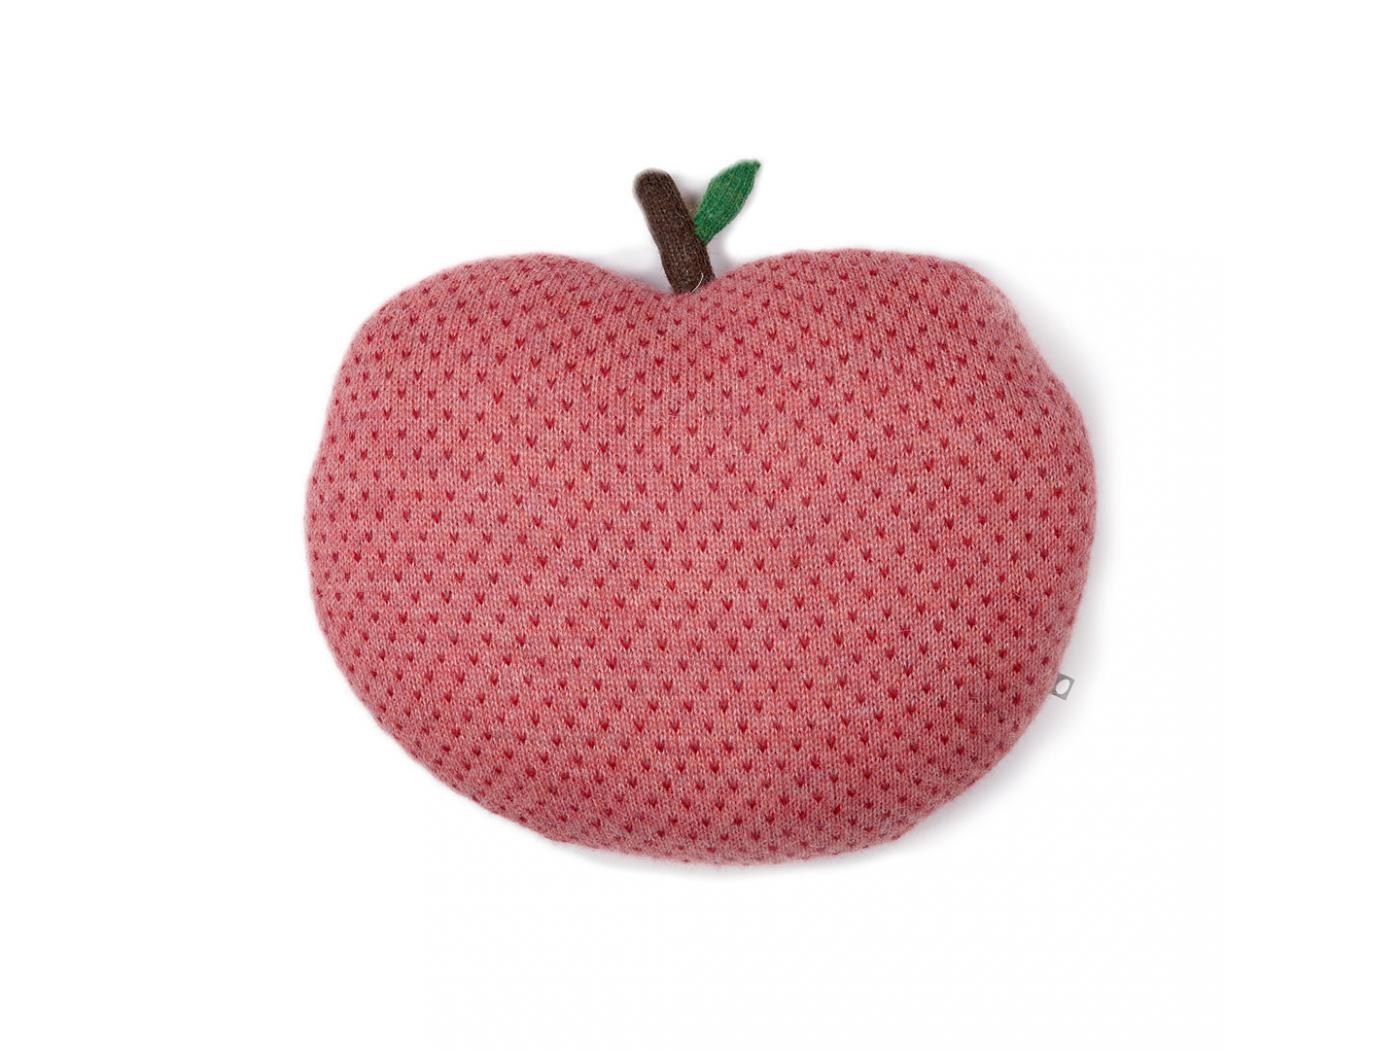 Oeuf Baby Clothes Coussin Pomme Rouge Et Rose En Alpaga